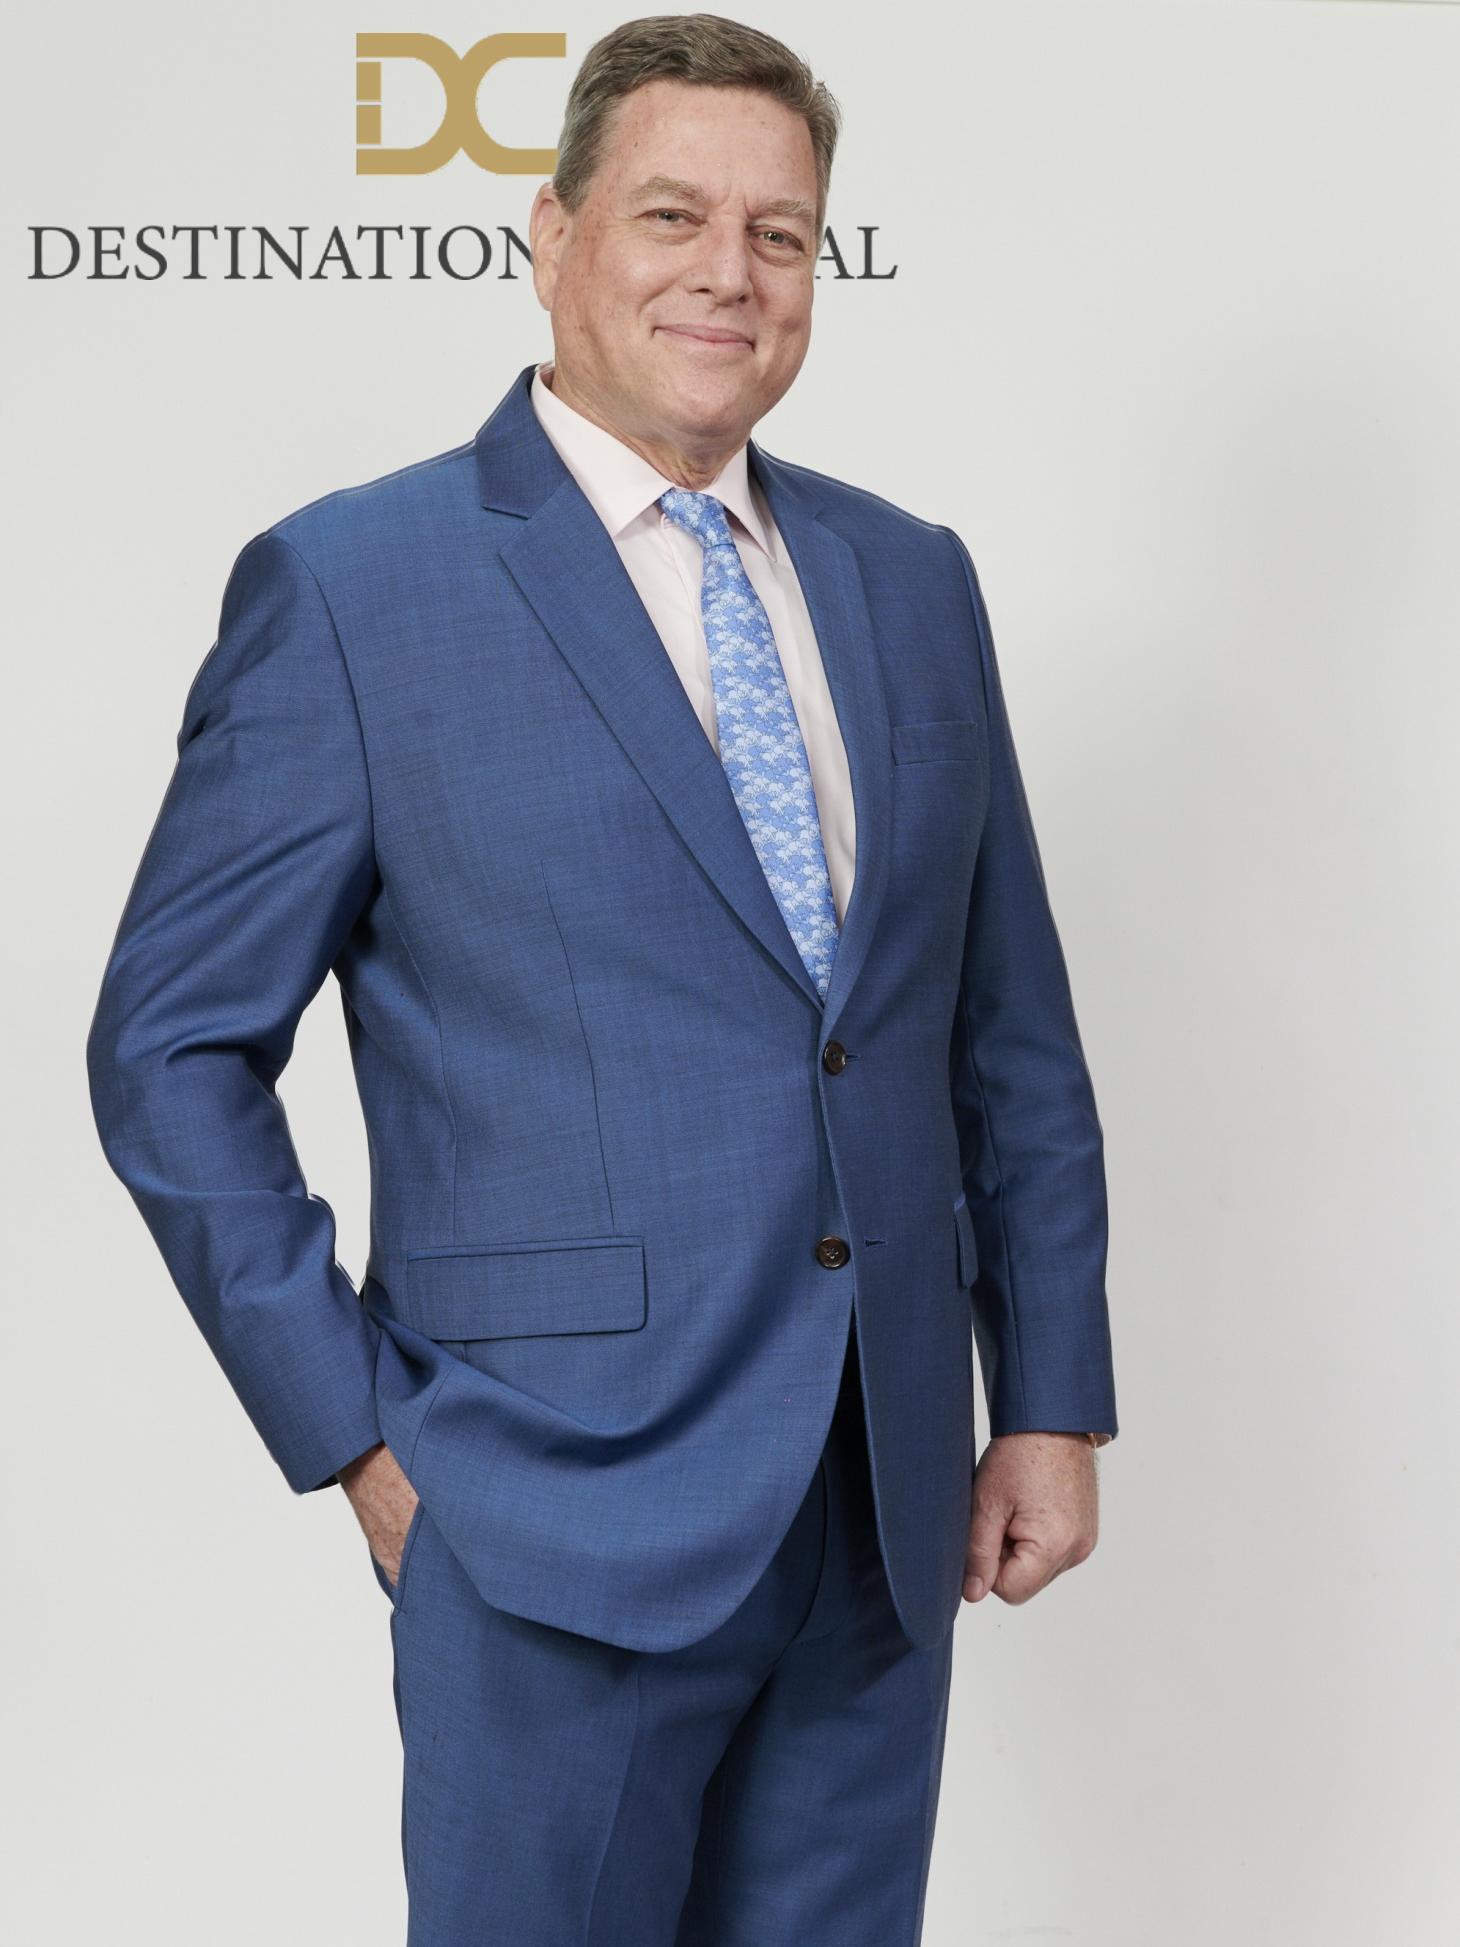 James A. Kaplan Chief Executive Officer, Destination Capital Co., Ltd.